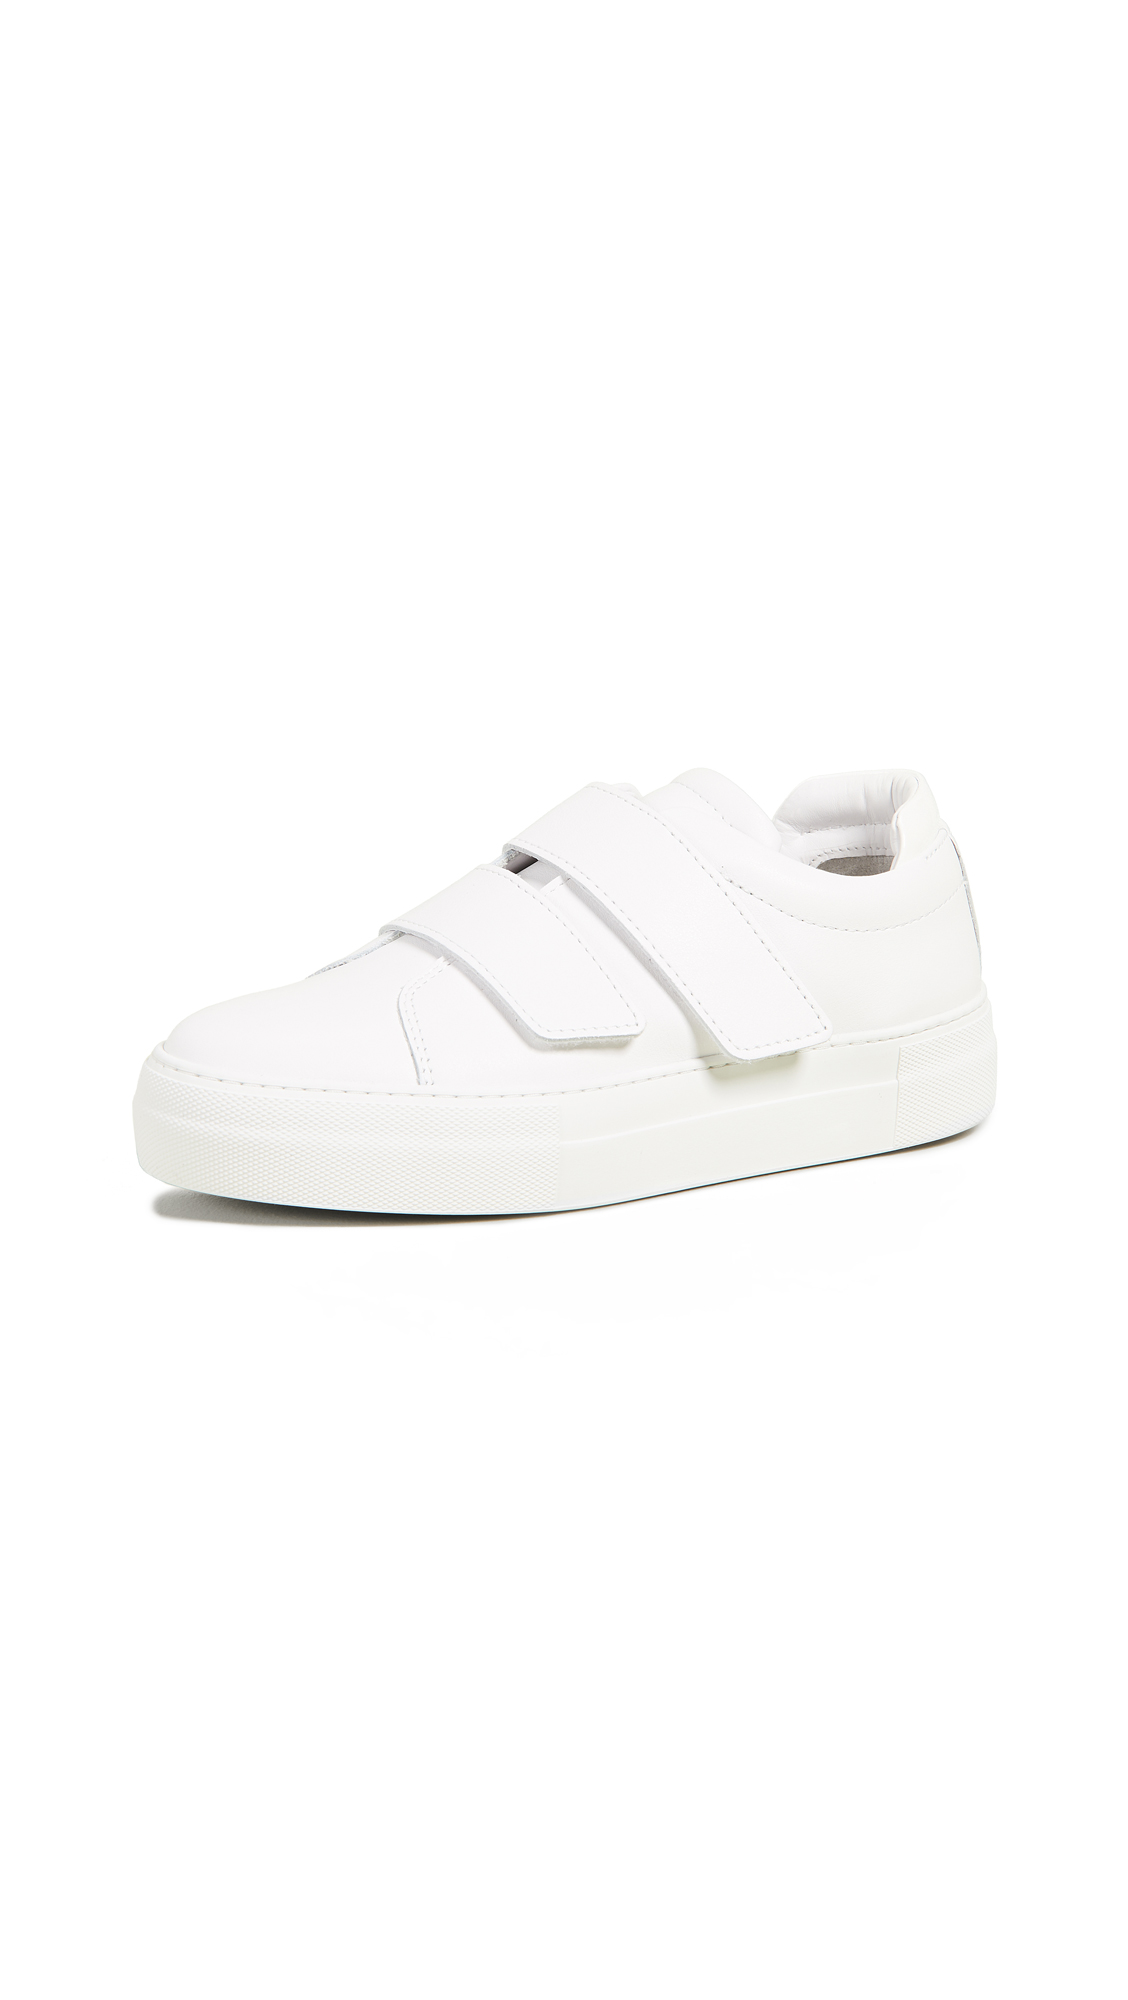 WANT Les Essentiels Lalibela Velcro Strap Sneakers - White